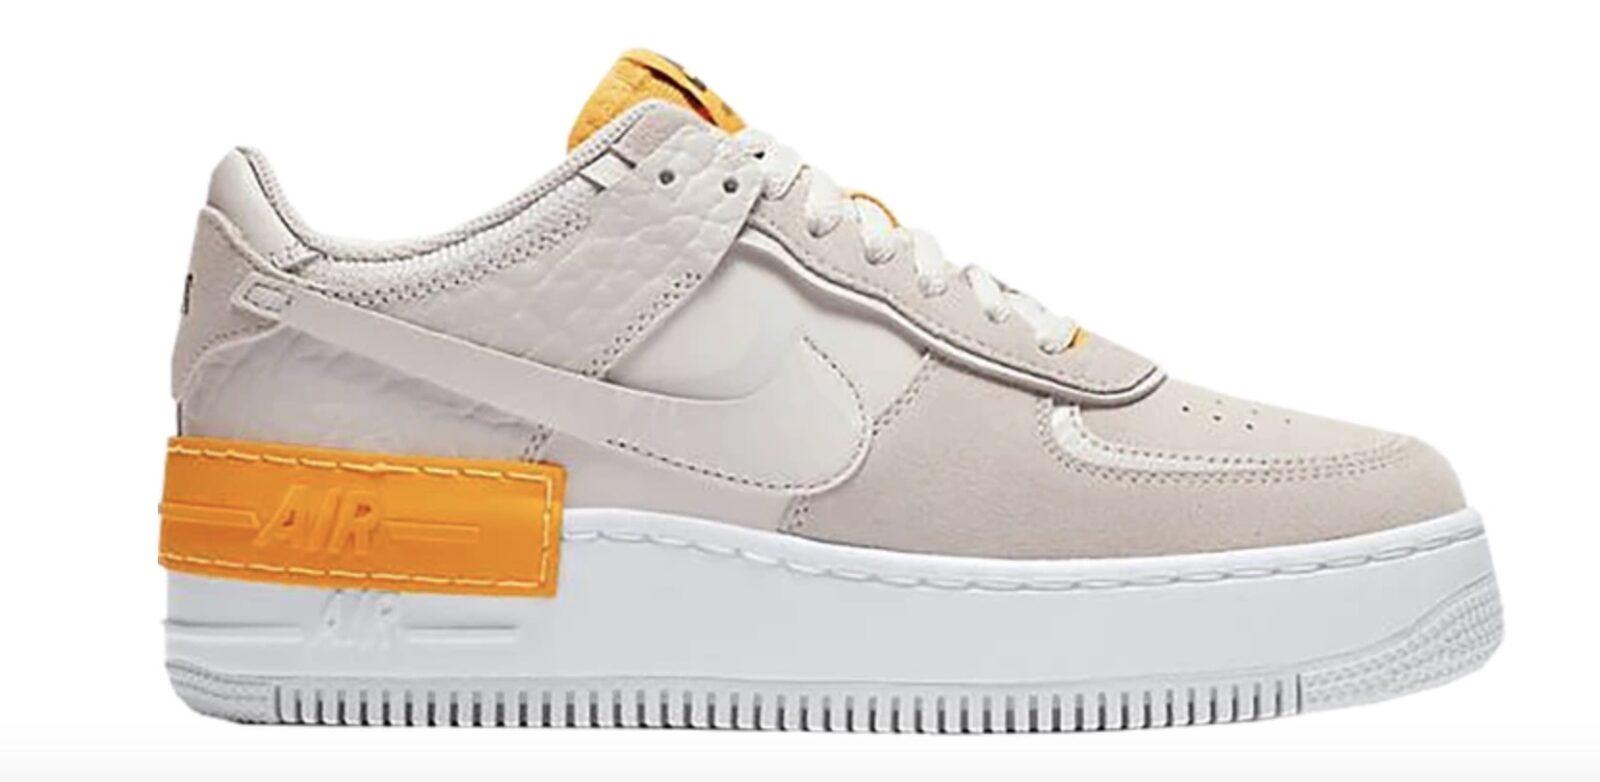 Nike Air Force 1 Shadow Grey Laser Orange